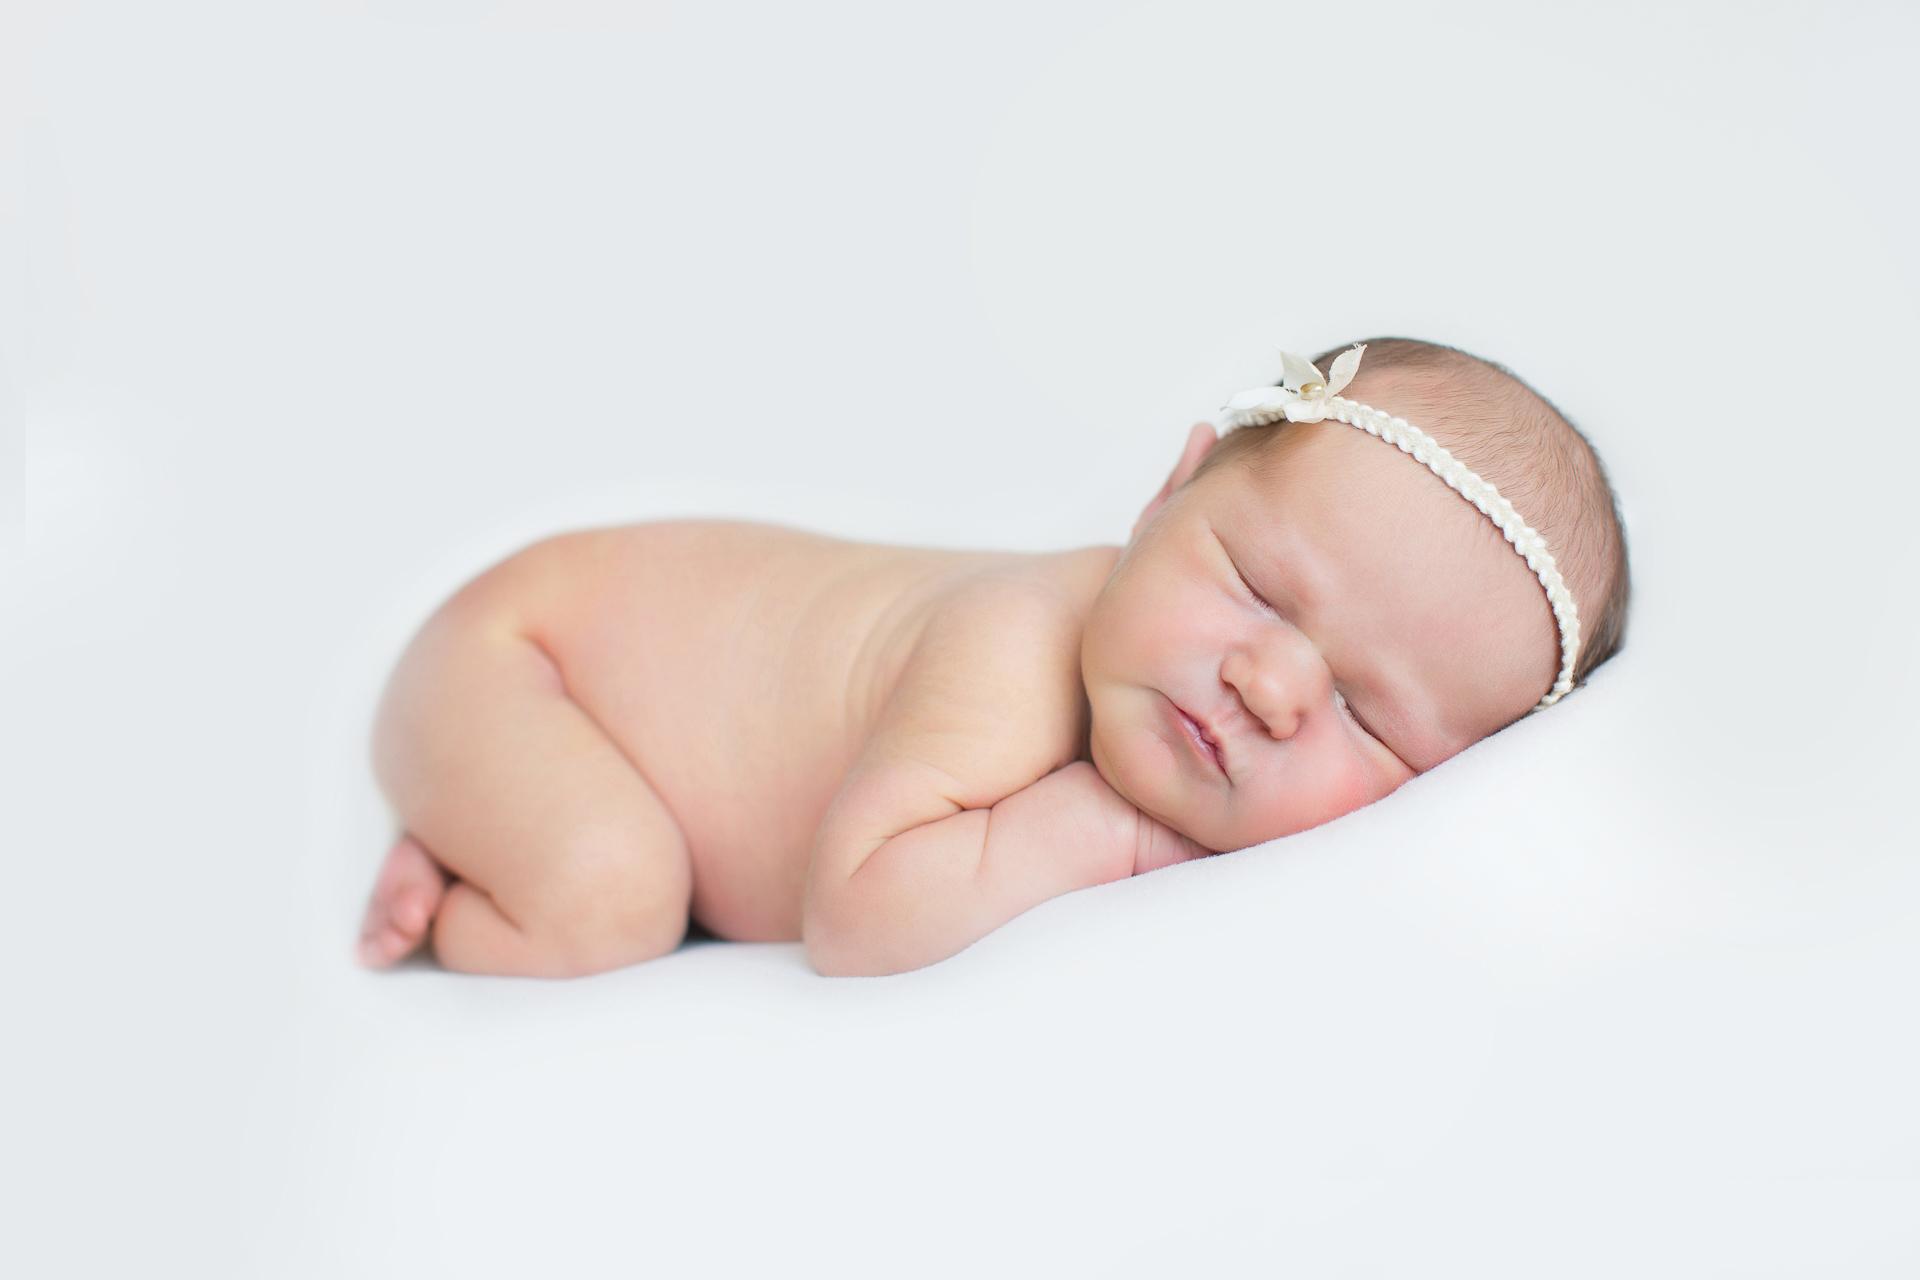 newborn-sleeping-with-cute-headband-1.jpg